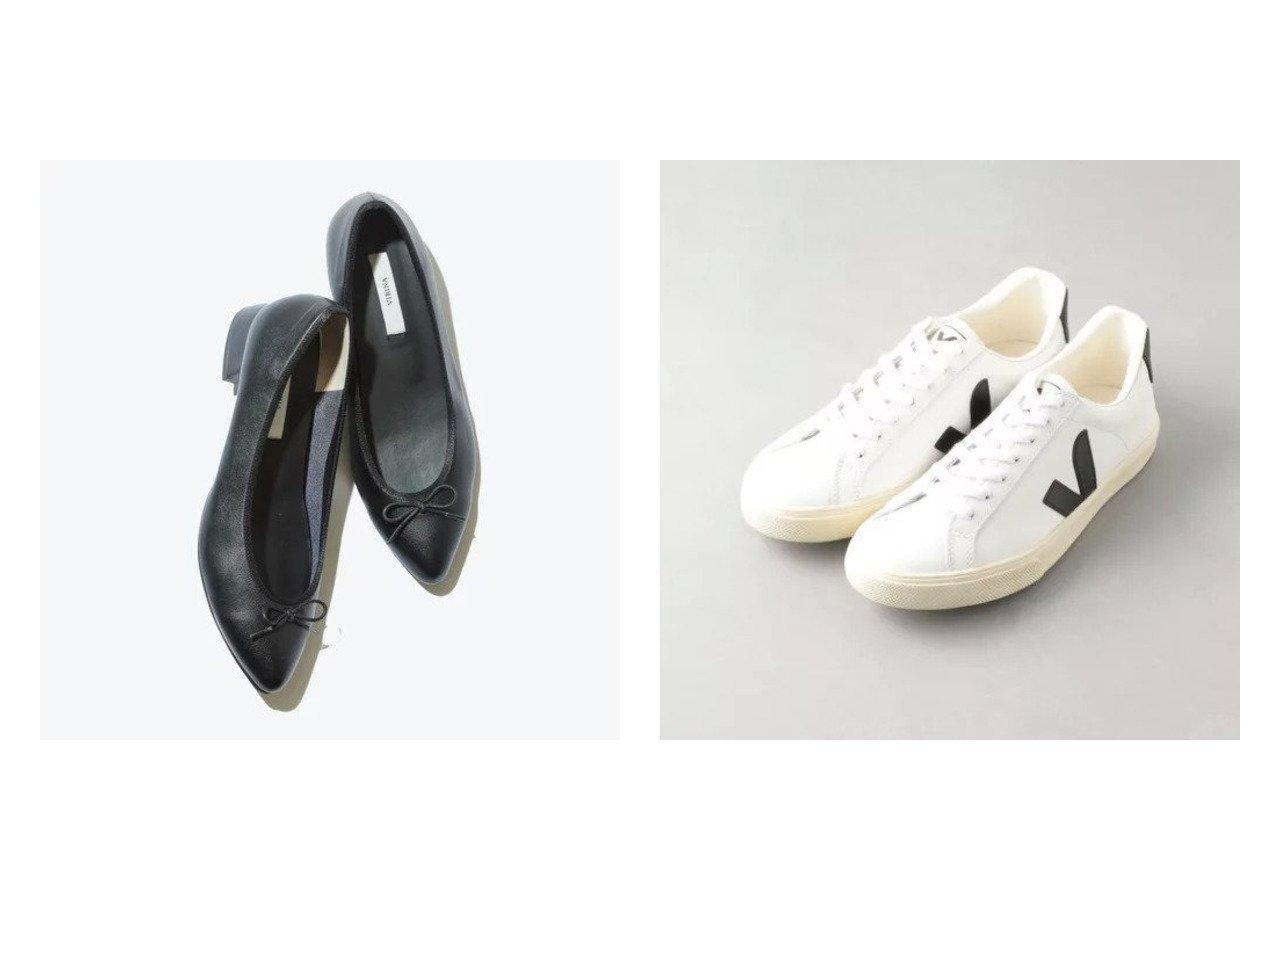 【VIRINA/ヴィリーナ】のポインテッドバレエヒールシューズ&【Odette e Odile/オデット エ オディール】のVEJA ESPLAR シューズ・靴のおすすめ!人気、トレンド・レディースファッションの通販 おすすめで人気の流行・トレンド、ファッションの通販商品 メンズファッション・キッズファッション・インテリア・家具・レディースファッション・服の通販 founy(ファニー) https://founy.com/ ファッション Fashion レディースファッション WOMEN インソール インナー クッション 抗菌 サテン シューズ ストレッチ バランス バレエ フィット フェミニン フォルム リボン おすすめ Recommend シンプル スニーカー モダン モノトーン |ID:crp329100000022561